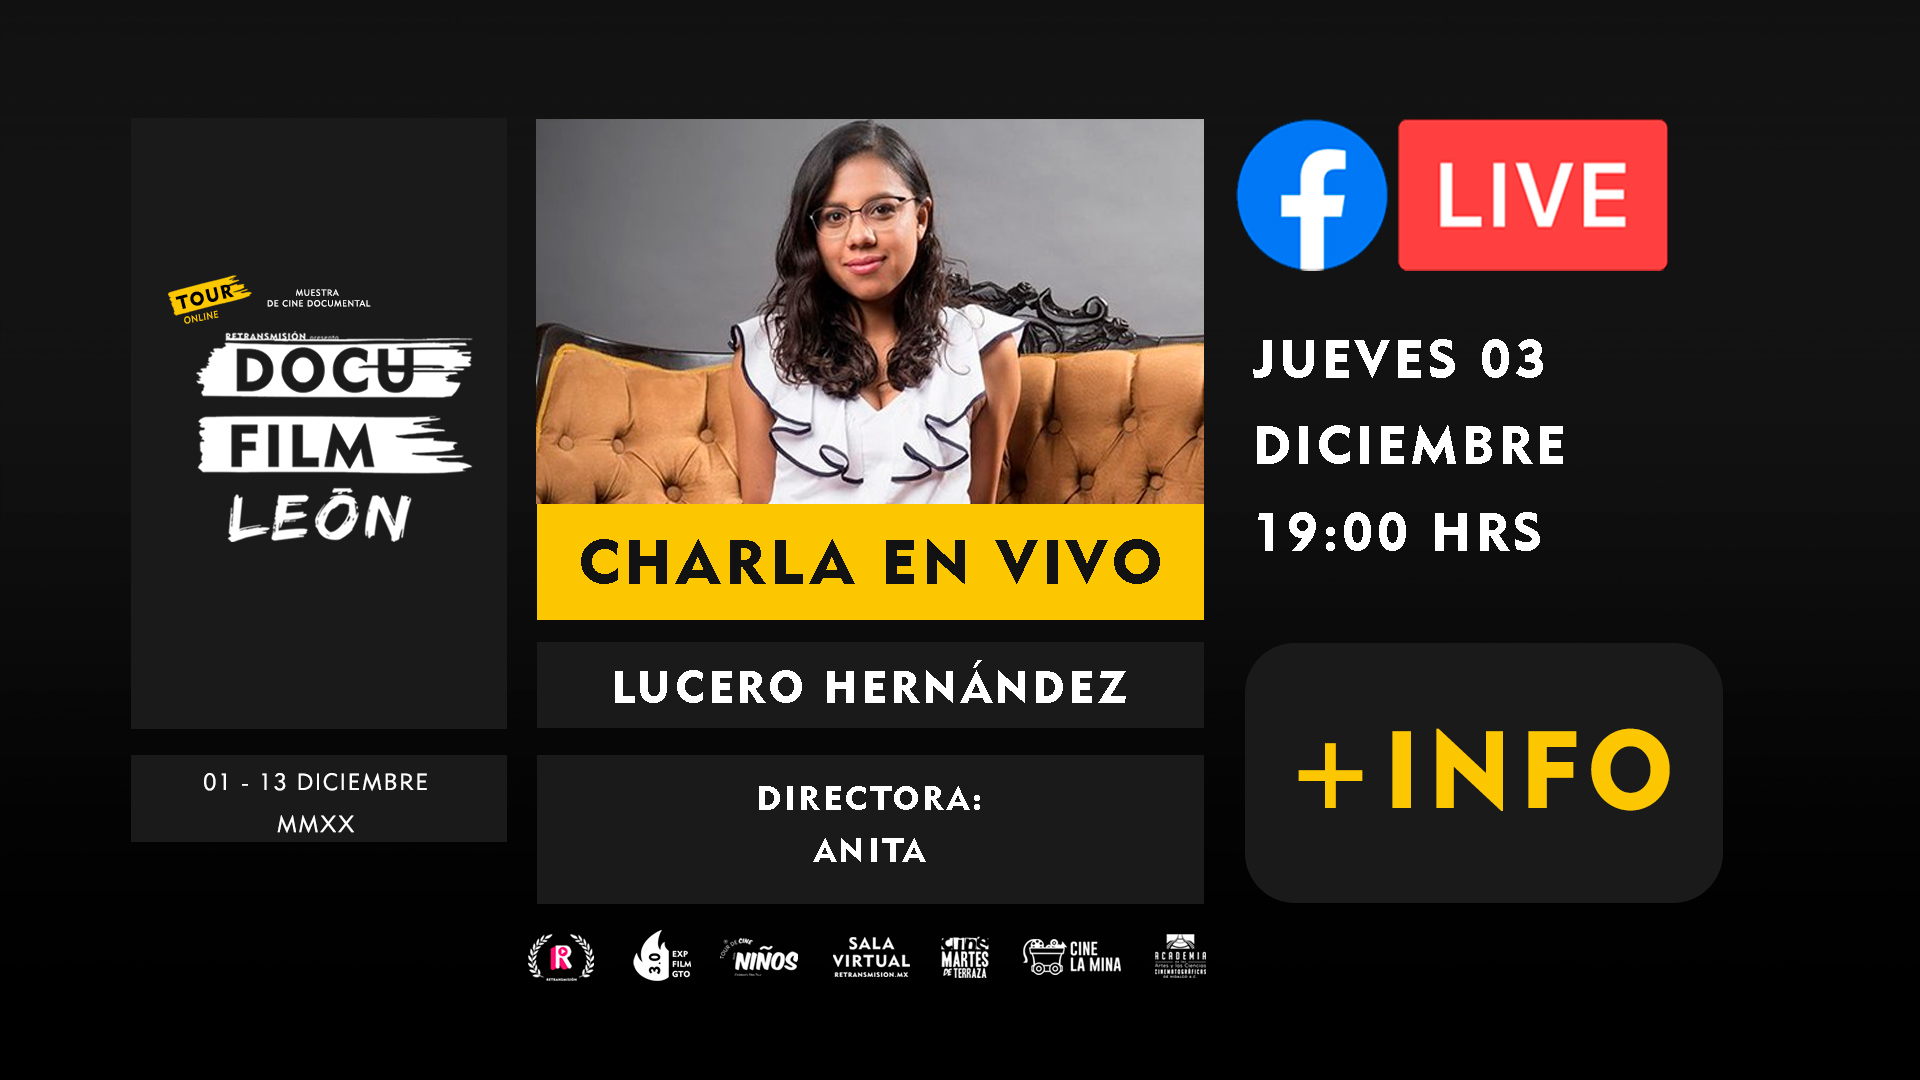 DIRECTORES-charlas+LUCERO-HERNANDEZ-DOCU-FILM-LEON-HORIZONTAL